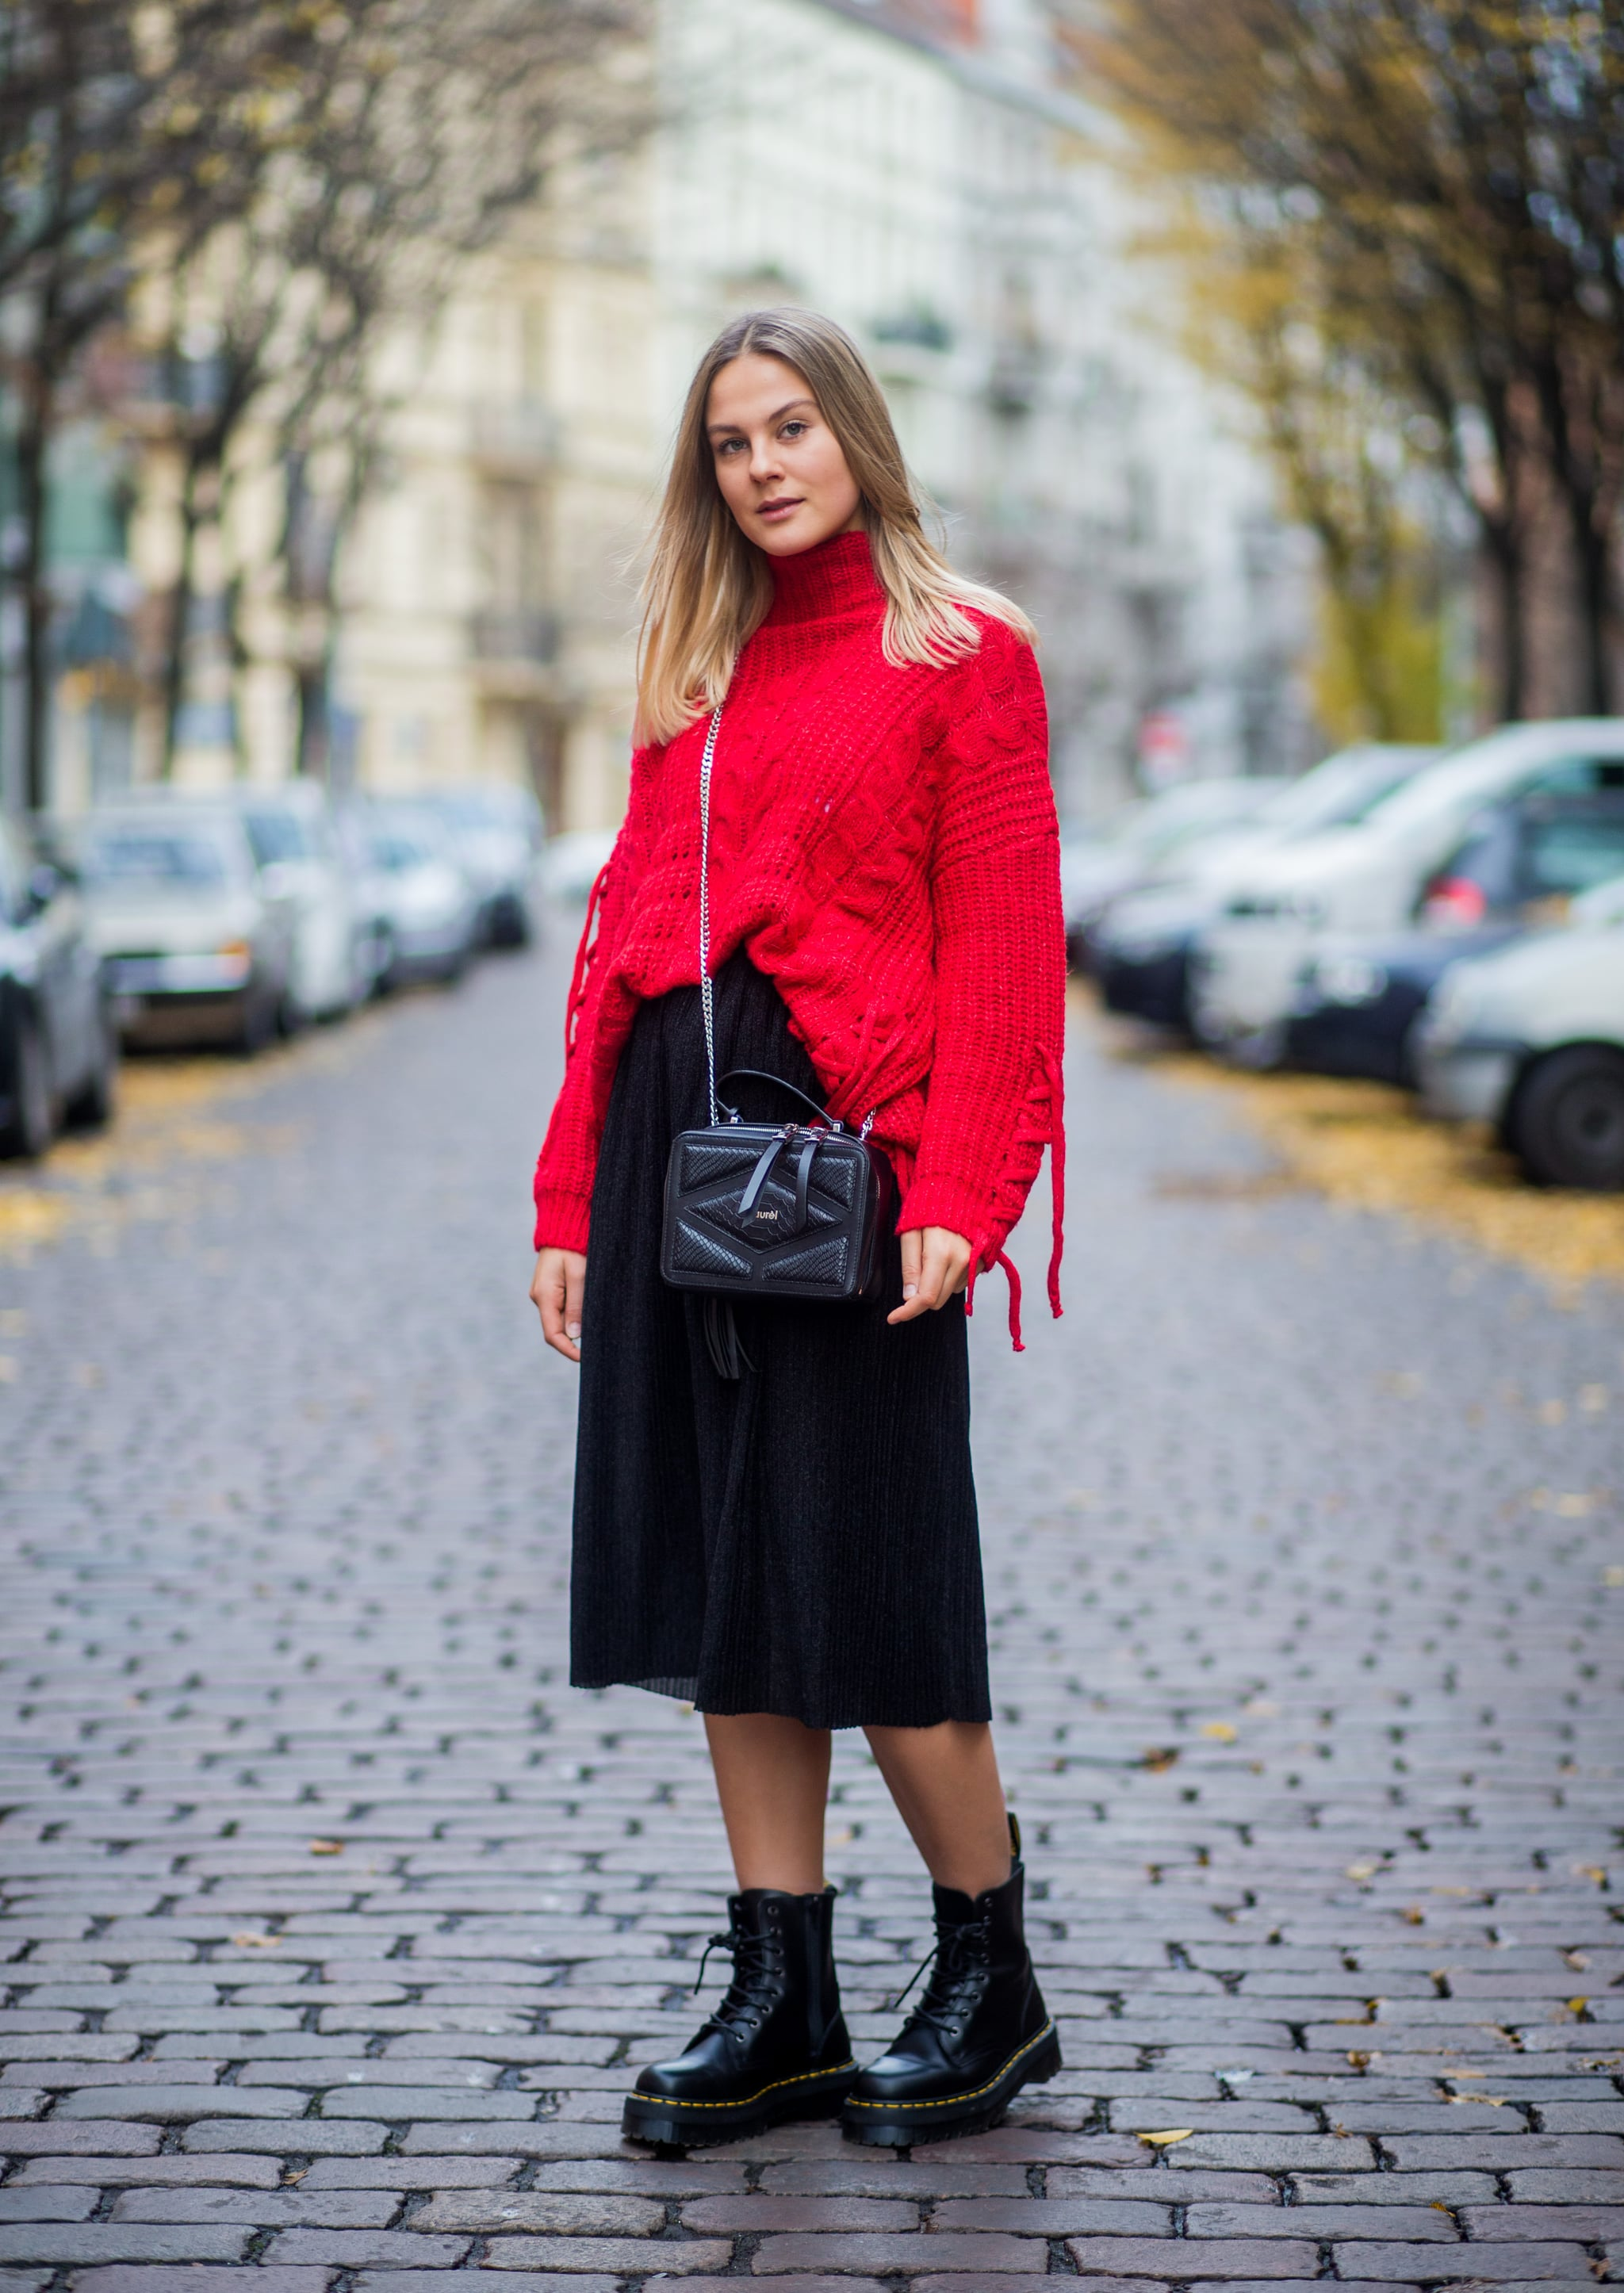 How to Wear Doc Martens | POPSUGAR Fashion